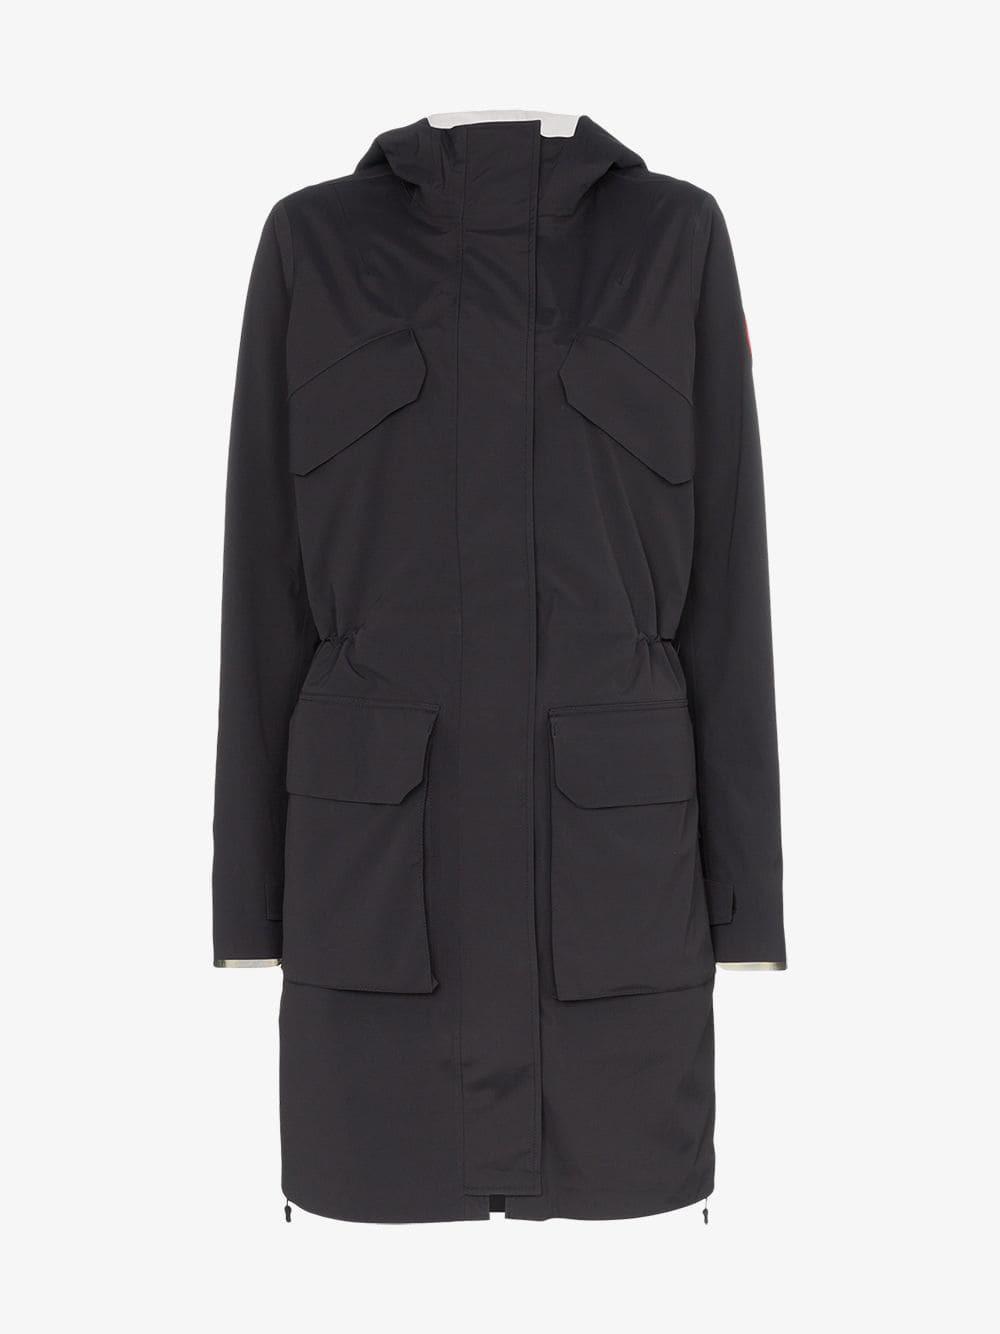 Canada Goose Seaboard reflective hooded jacket in black